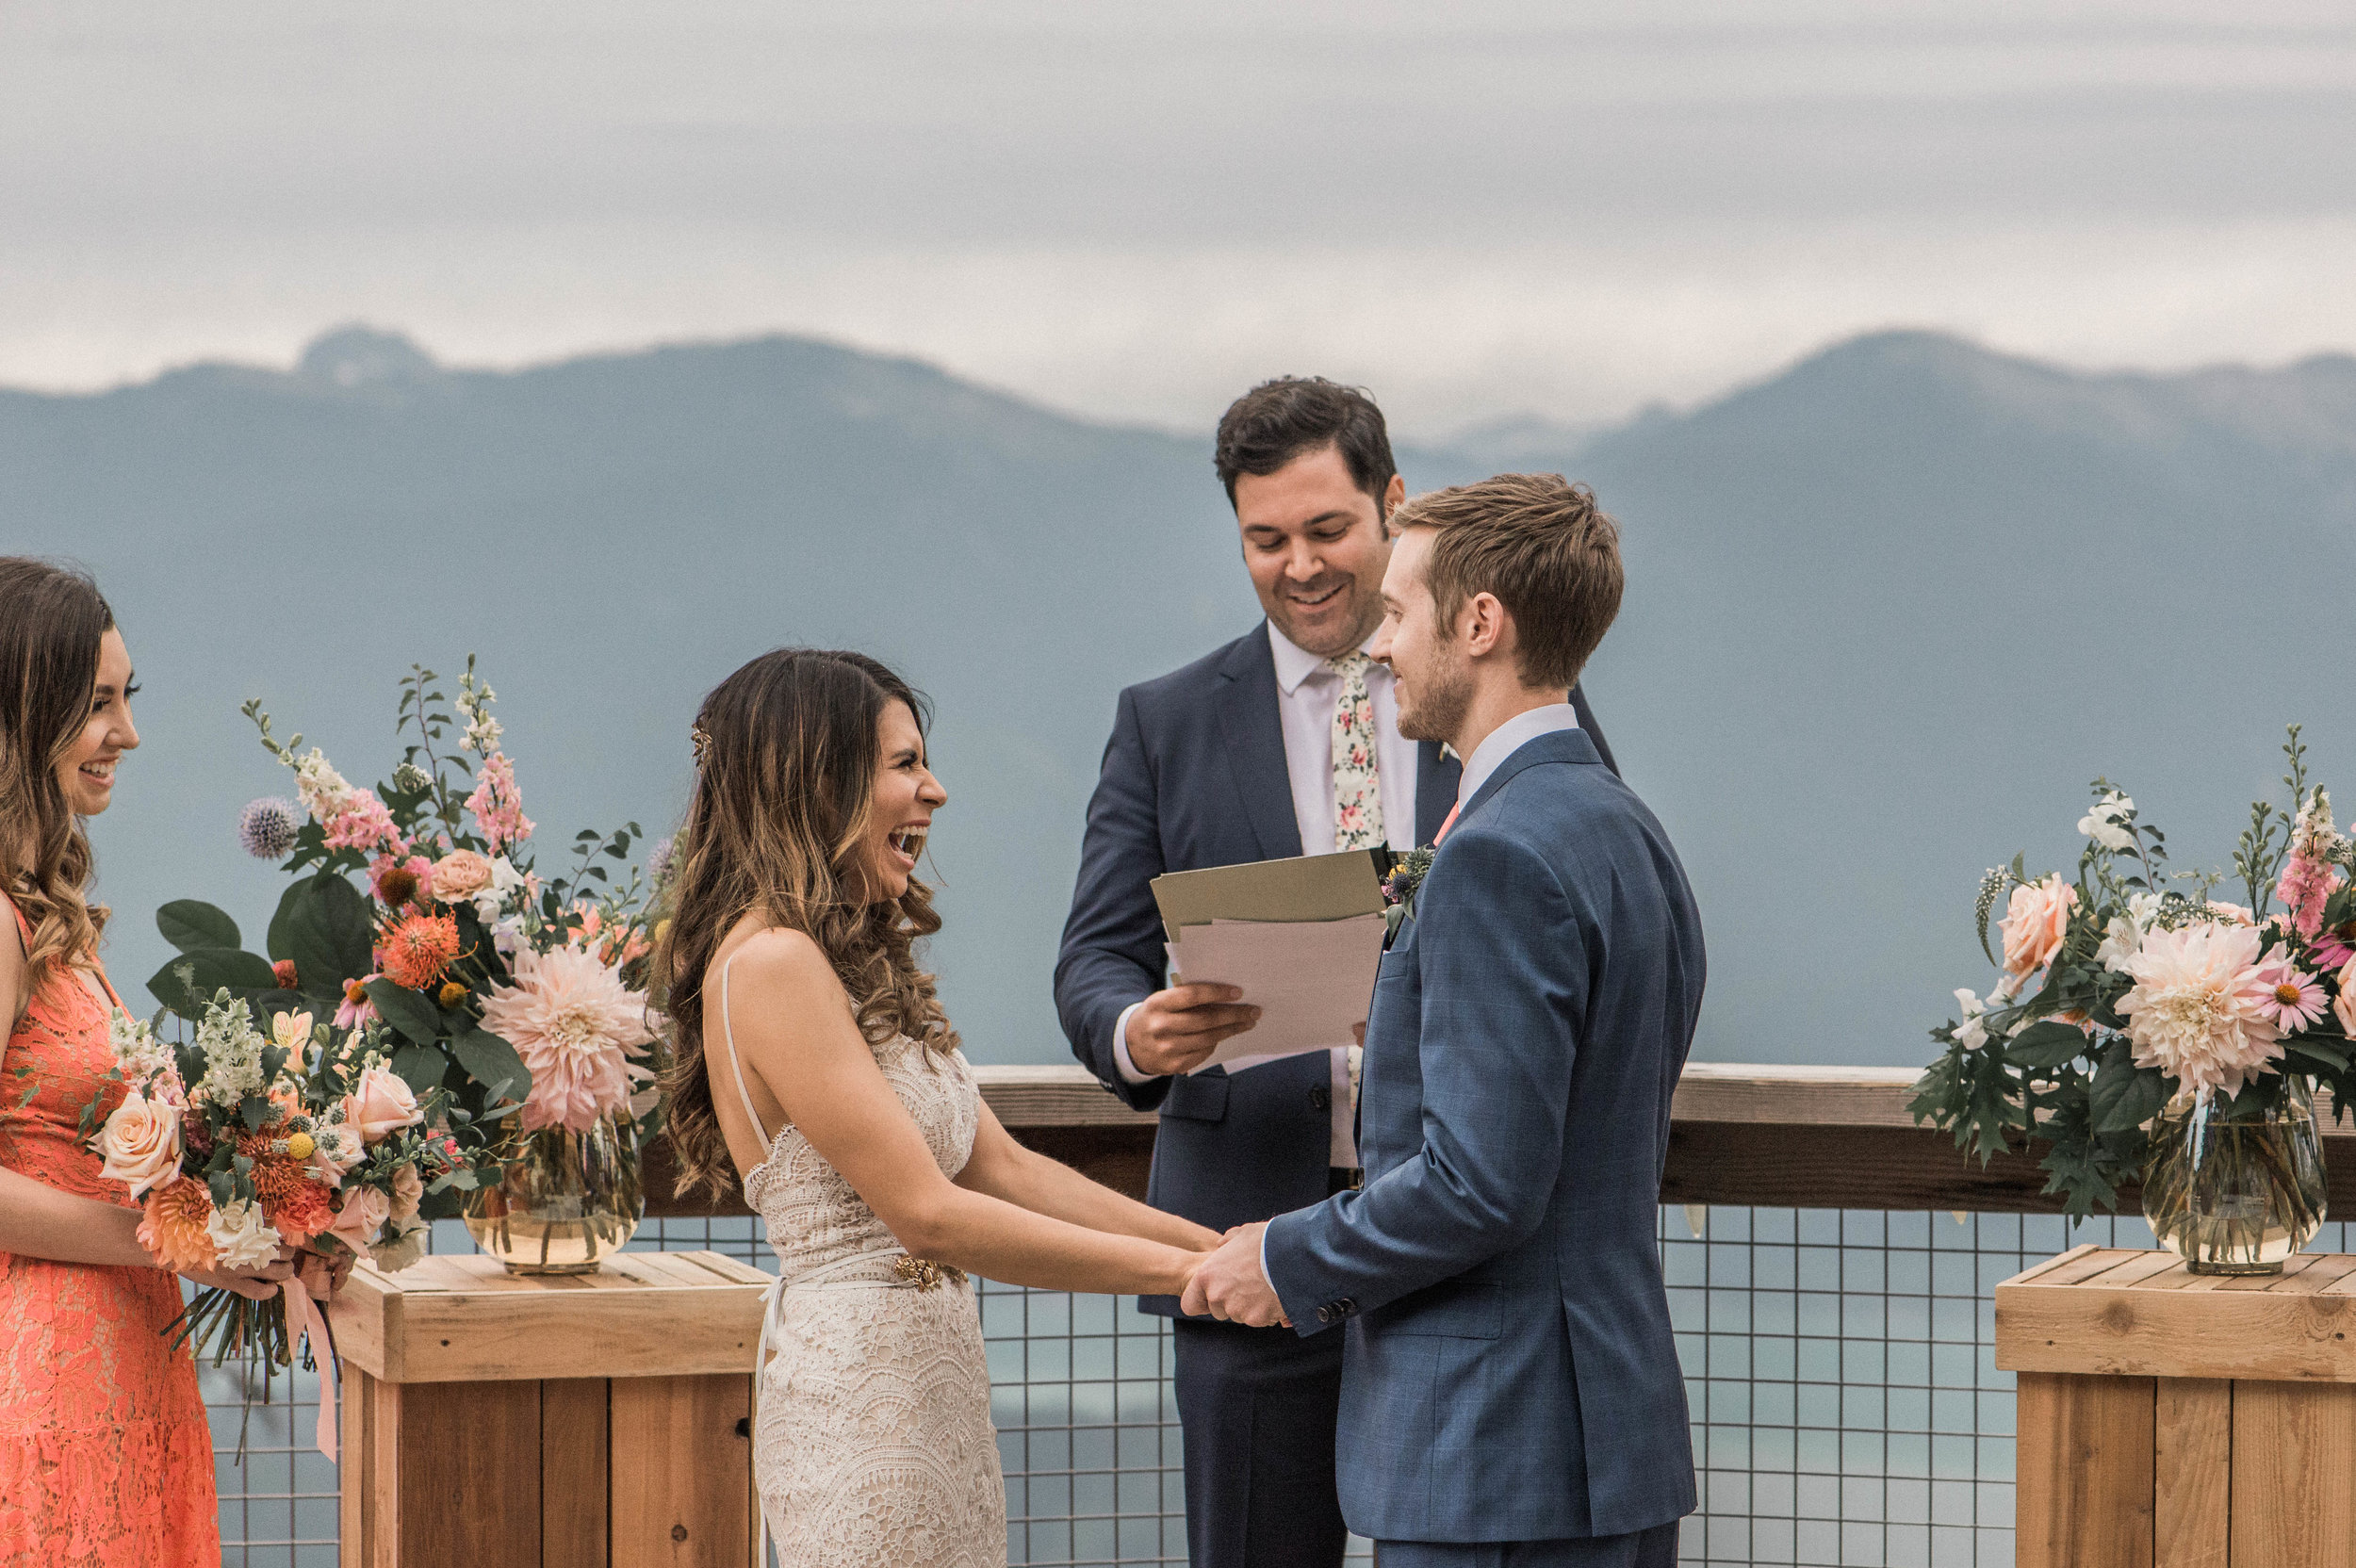 austin-texas-wedding-photography-1778-photographie-89.jpg